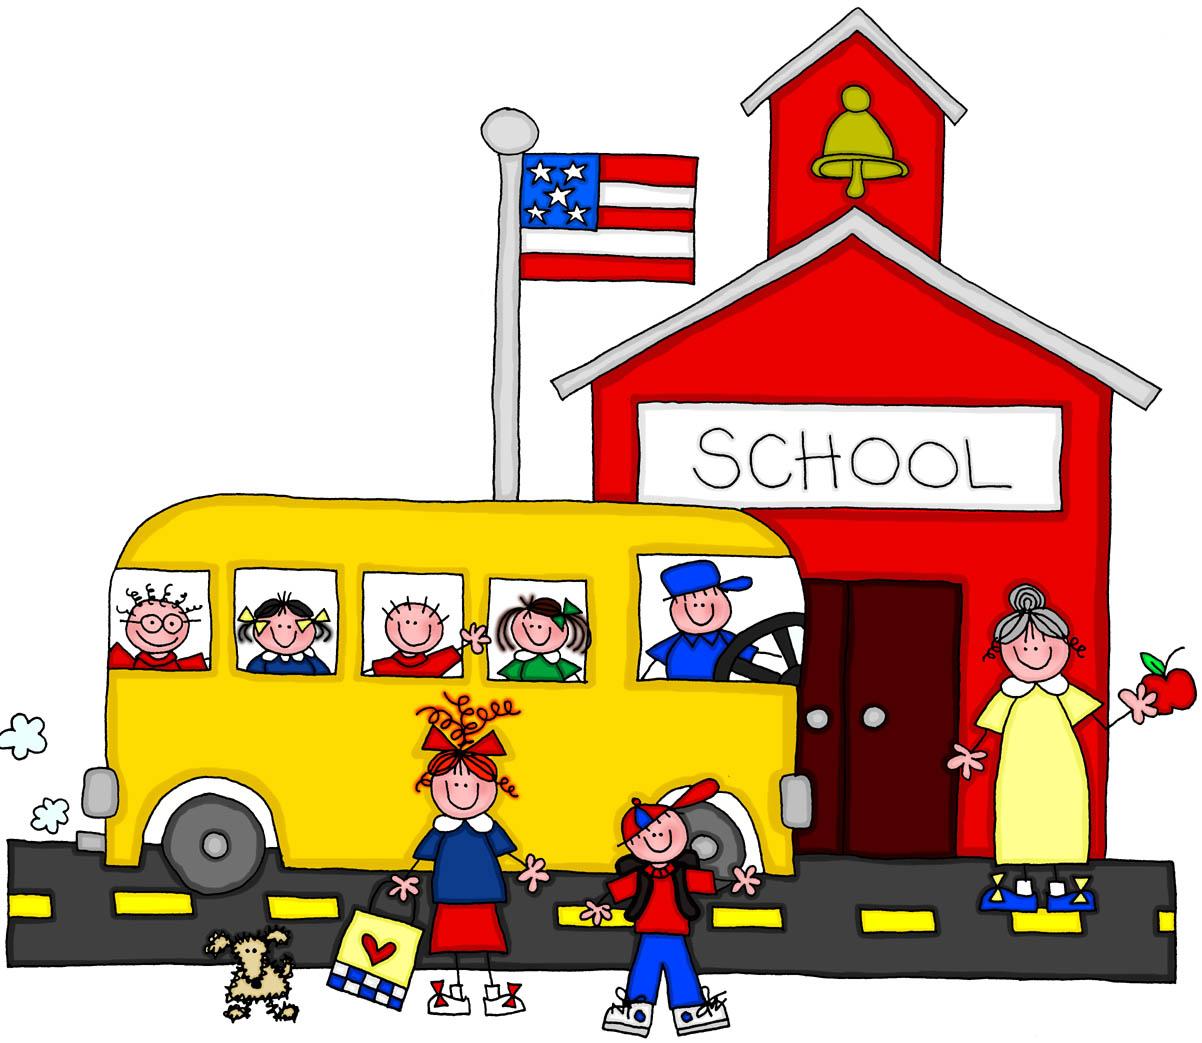 School site council clipart clip art royalty free download Oneonta Programs Information / School Site Council/Concilio ... clip art royalty free download